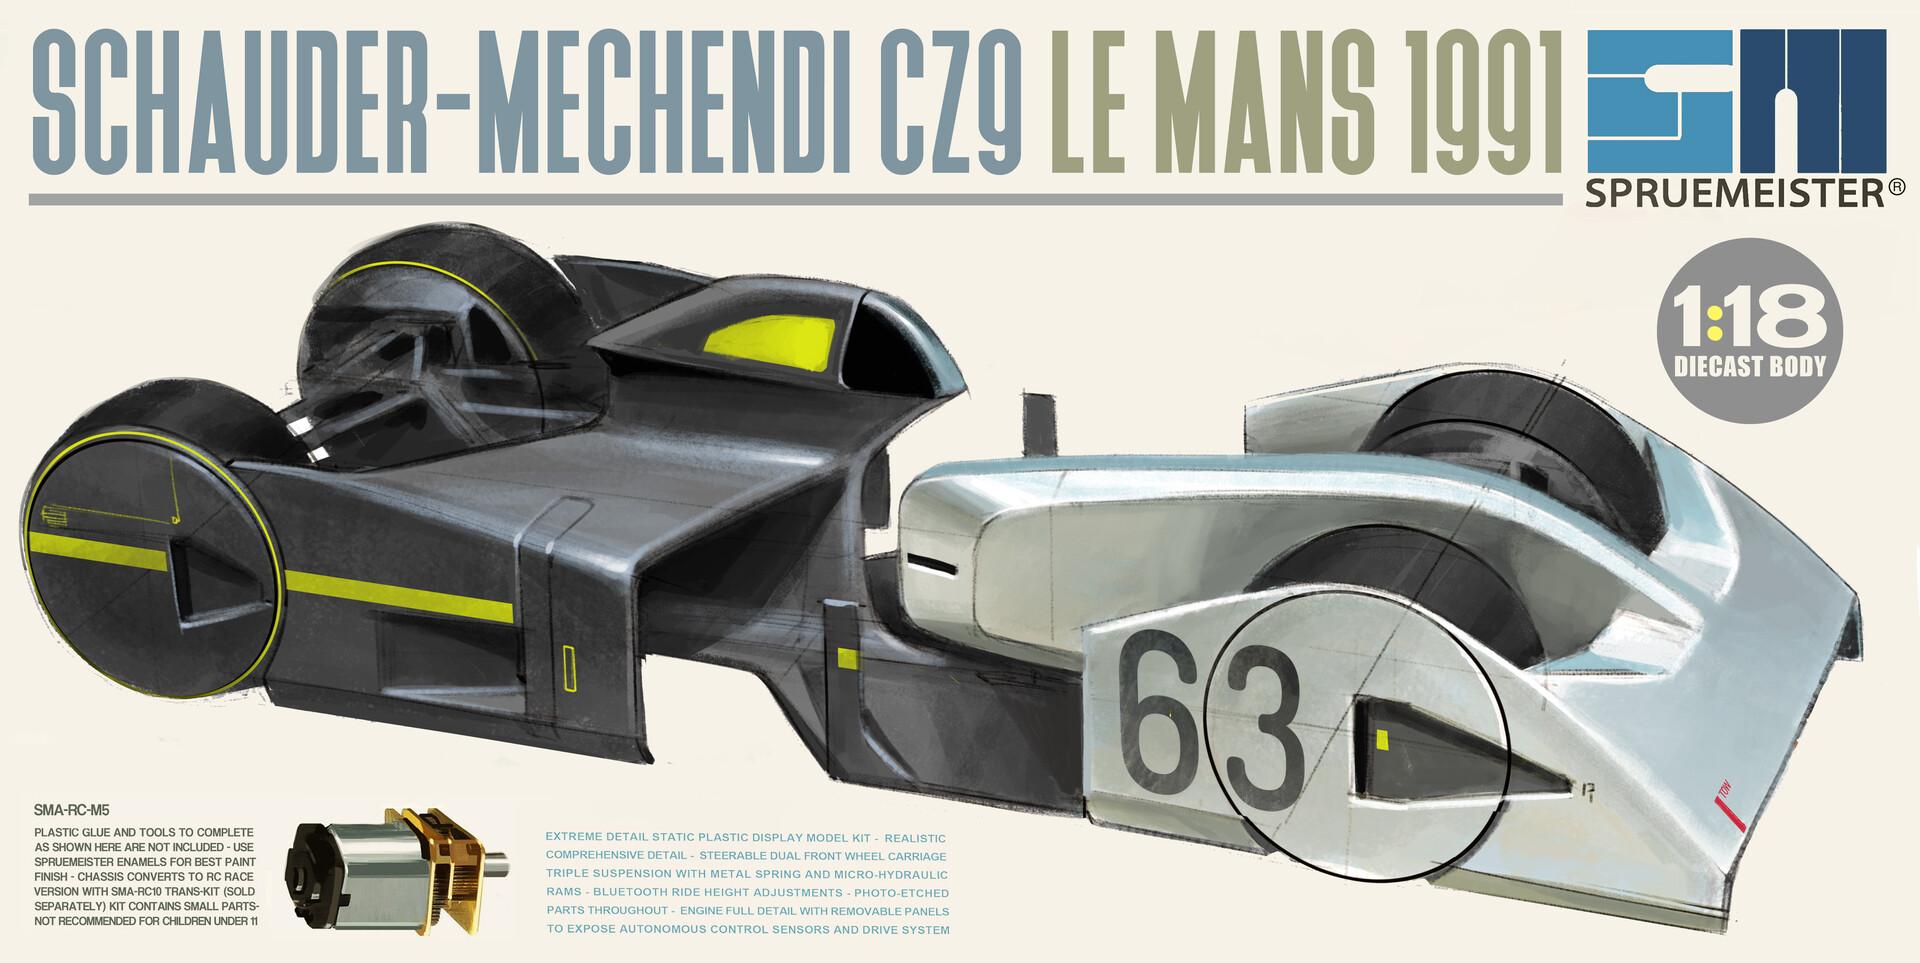 ArtStation - Schauder-Mechendi CZ9 1989 Automata Le Mans